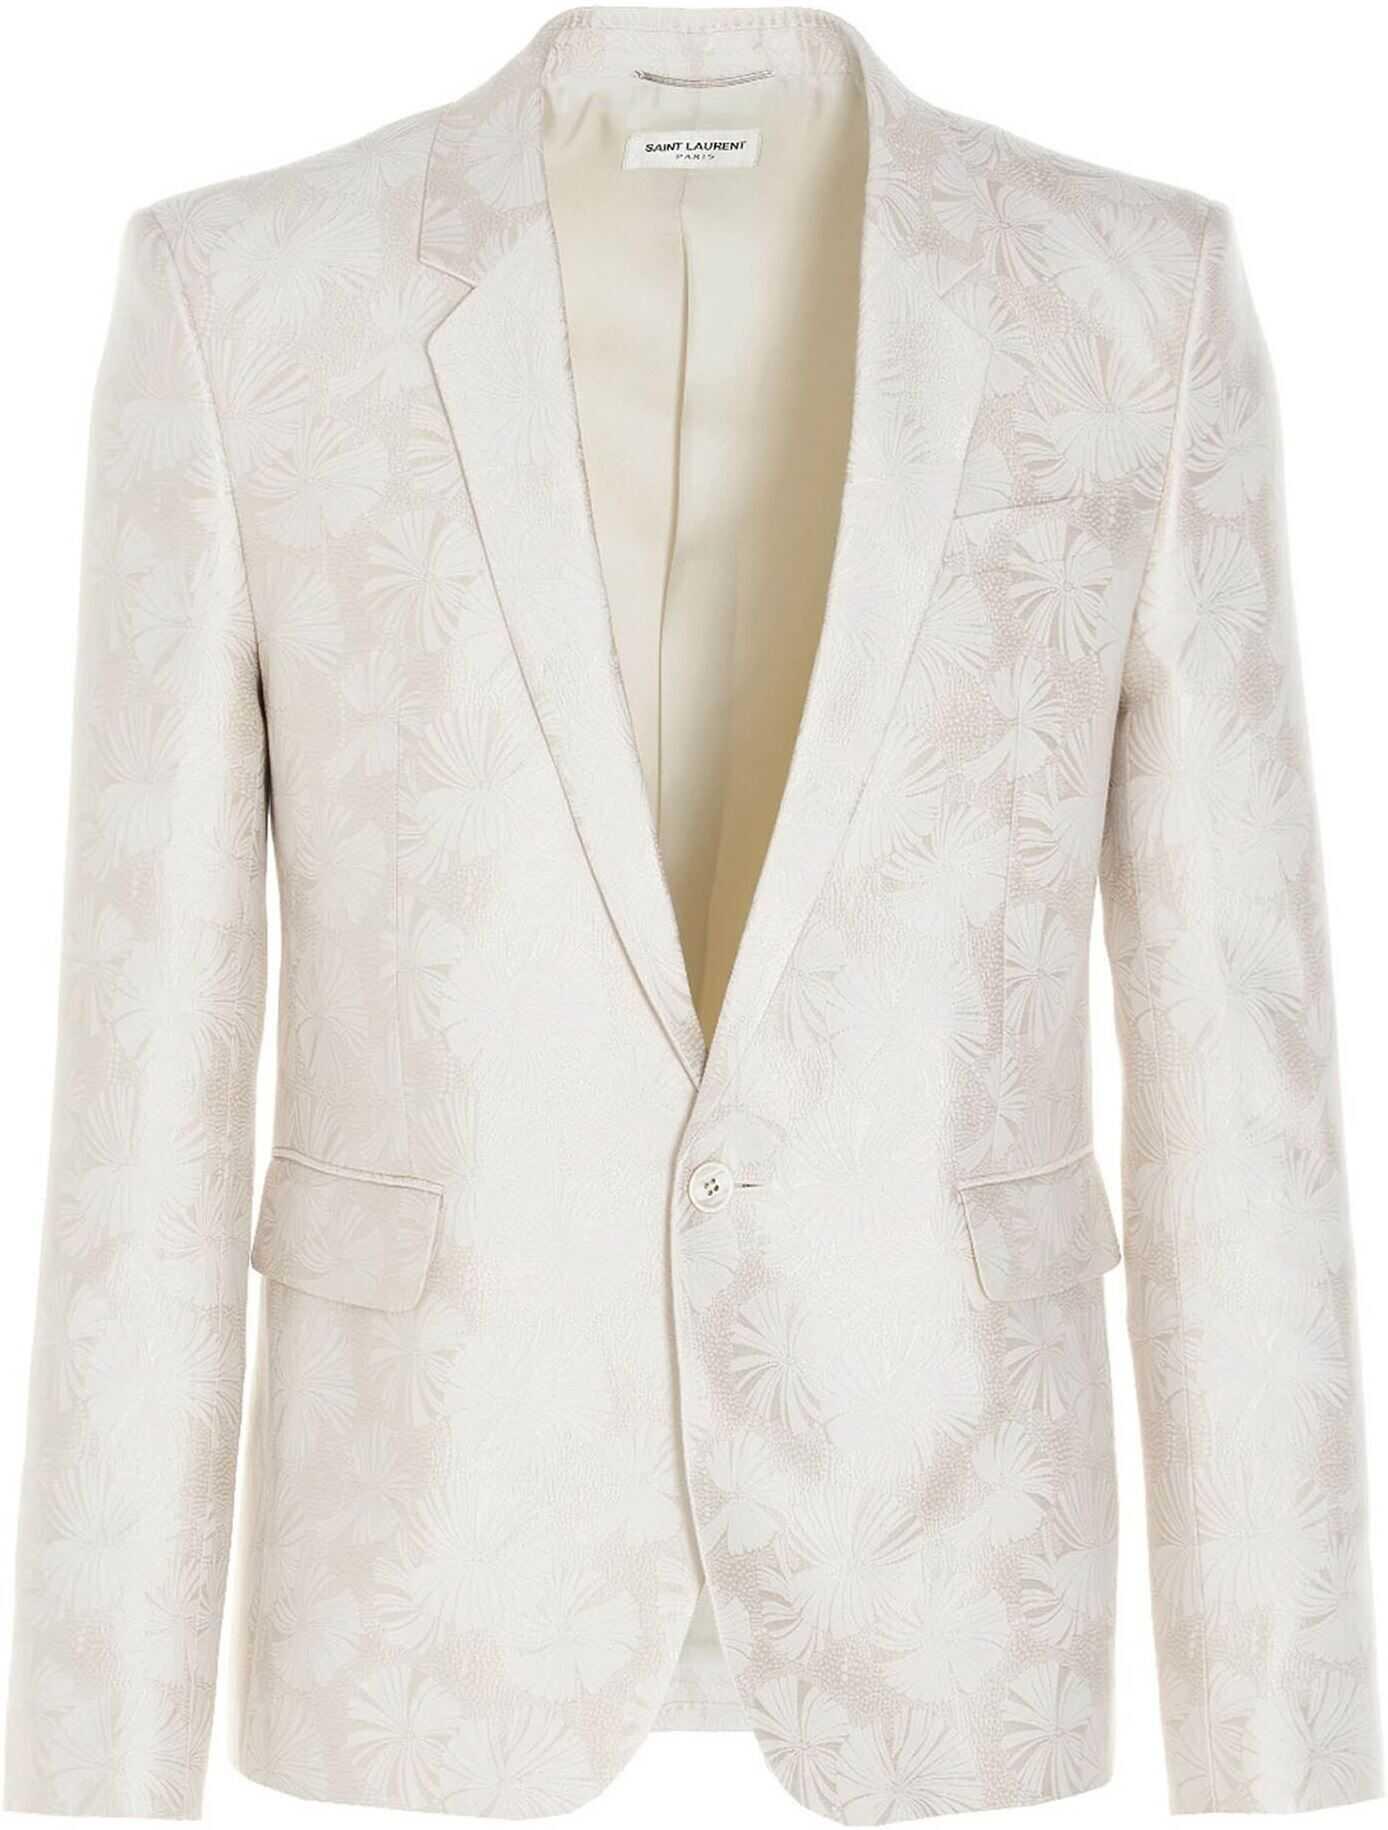 Saint Laurent Jacquard Jacket In White White imagine